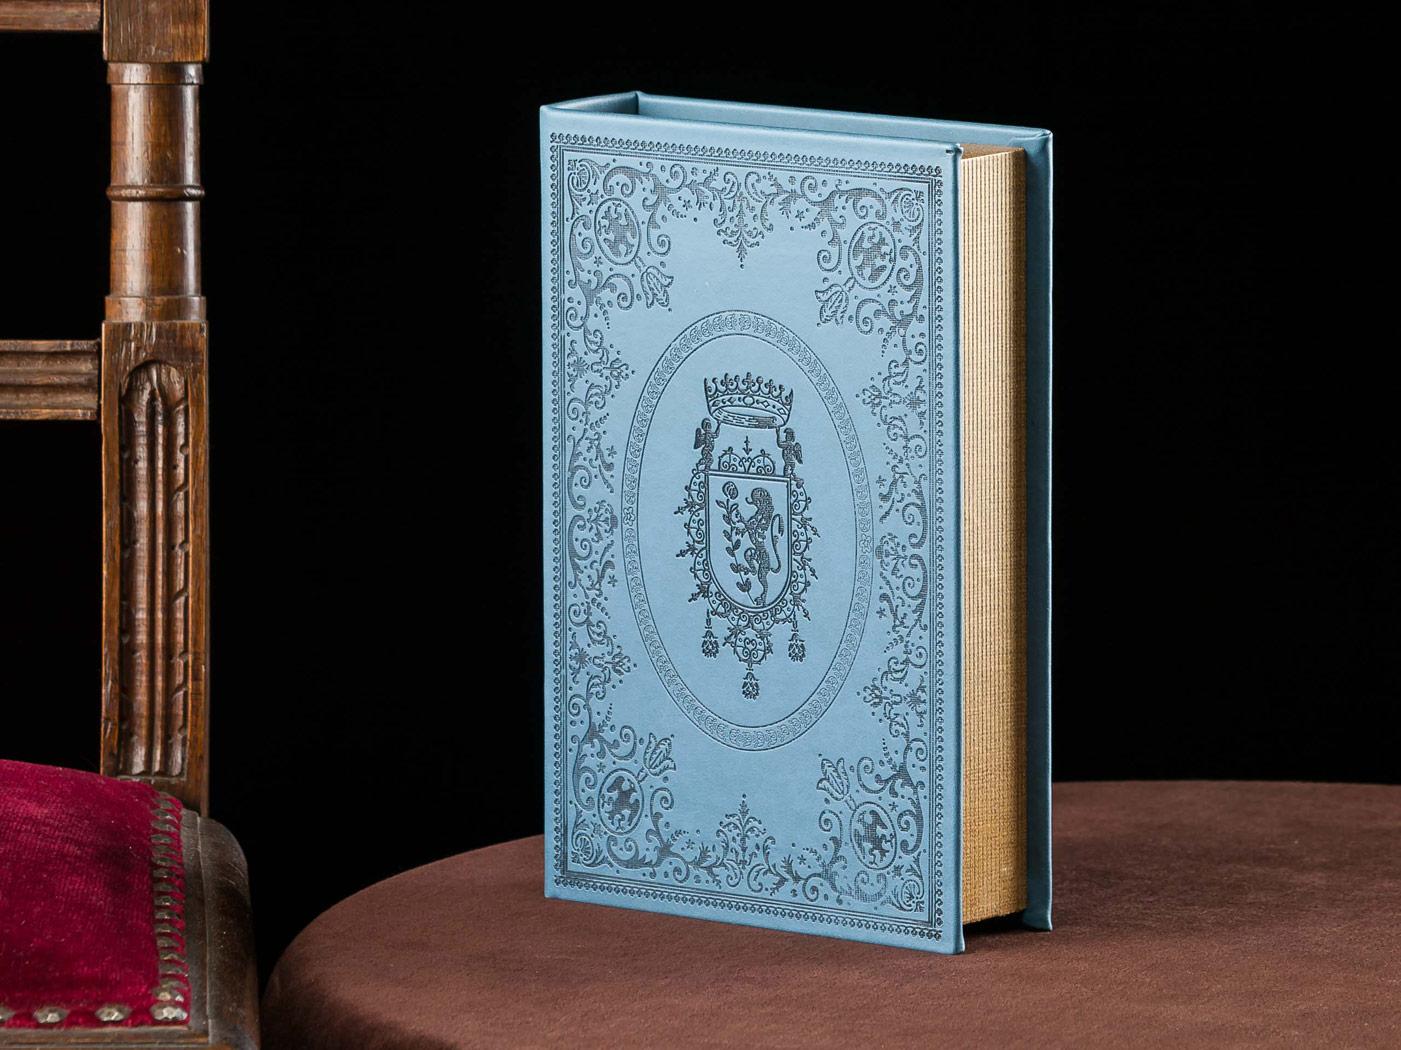 Blue book shape wooden box safe trappe secret book antique style ...